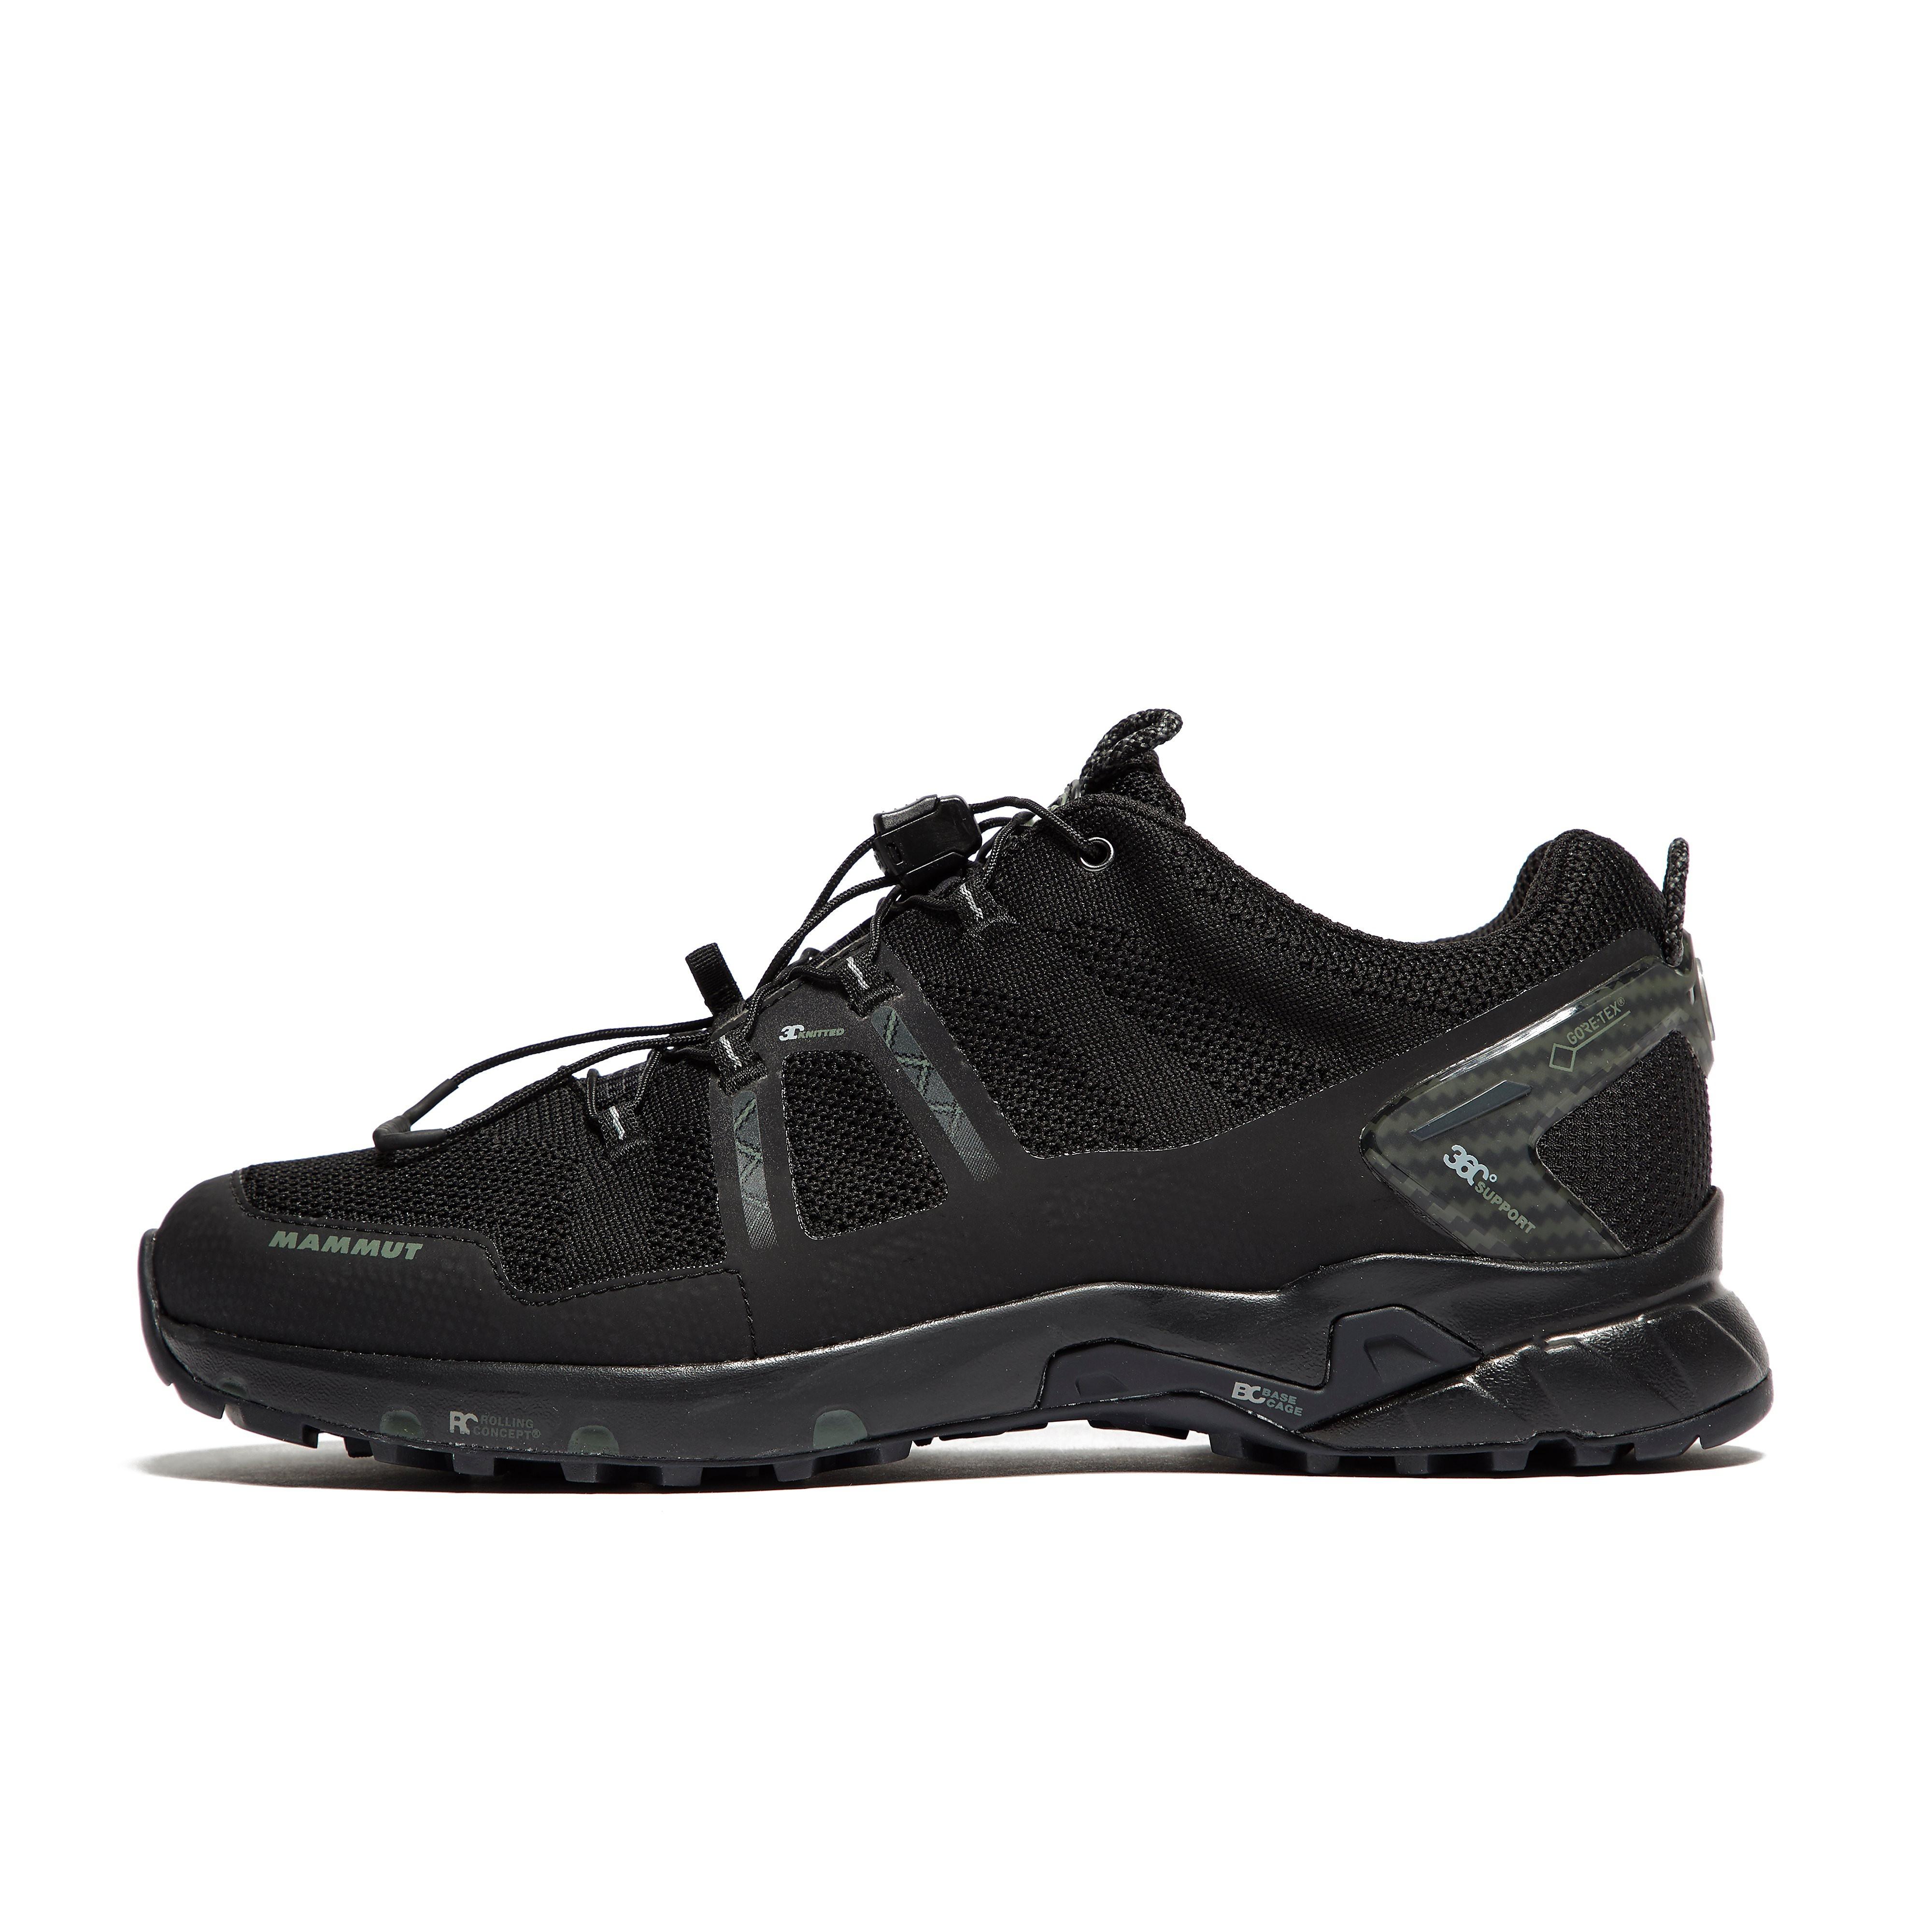 Mammut T Aegility Low GTX Men's Walking Shoes